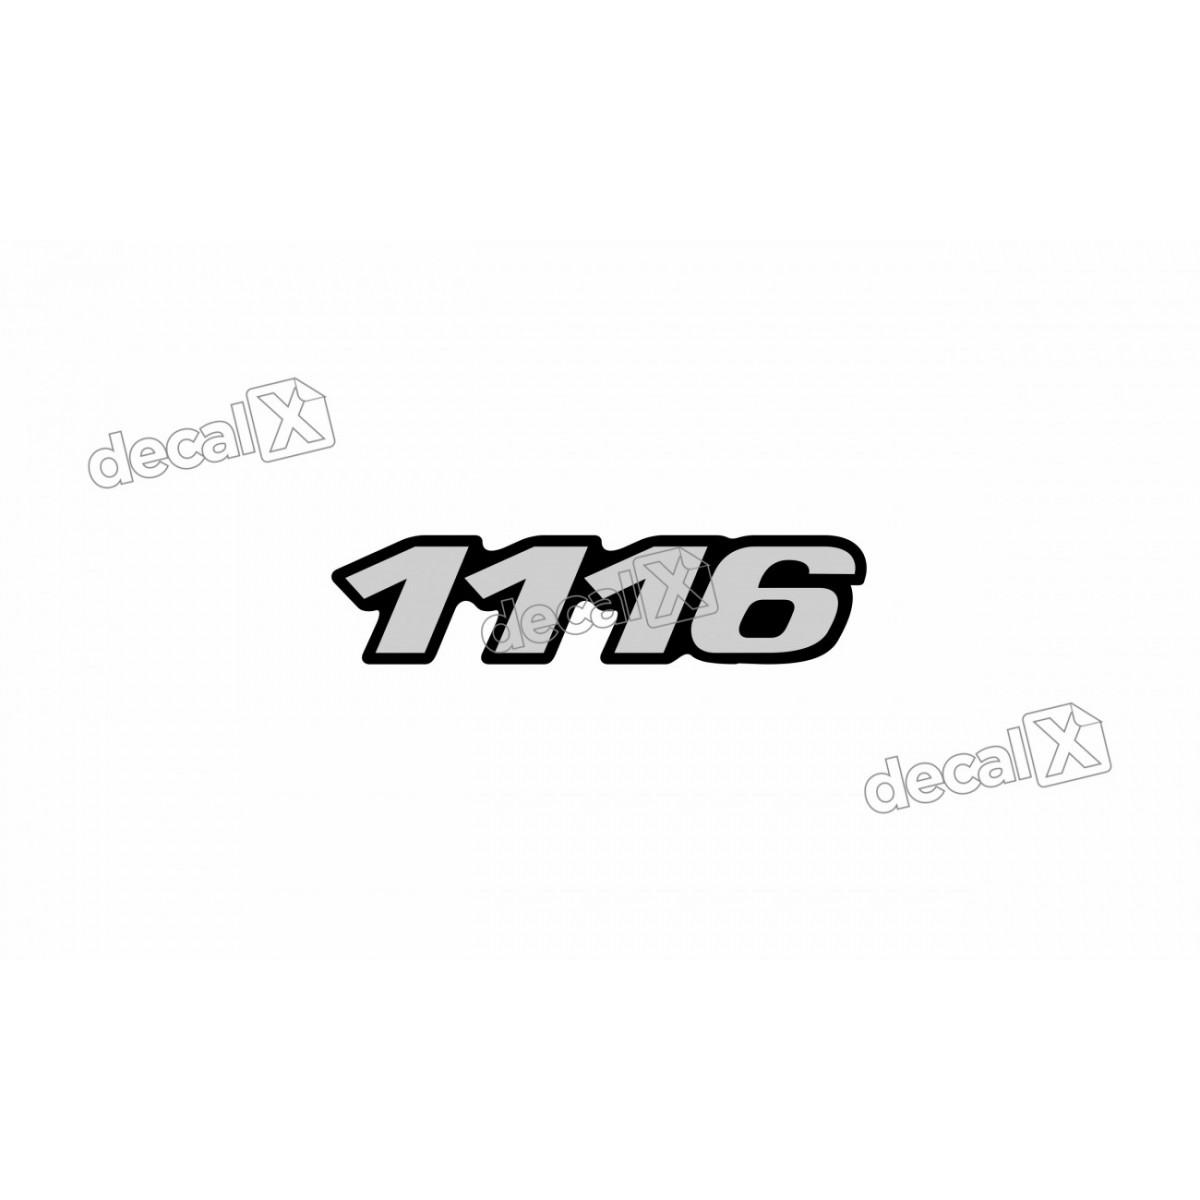 Adesivo Emblema Resinado Mercedes 1116 Cm18 Decalx